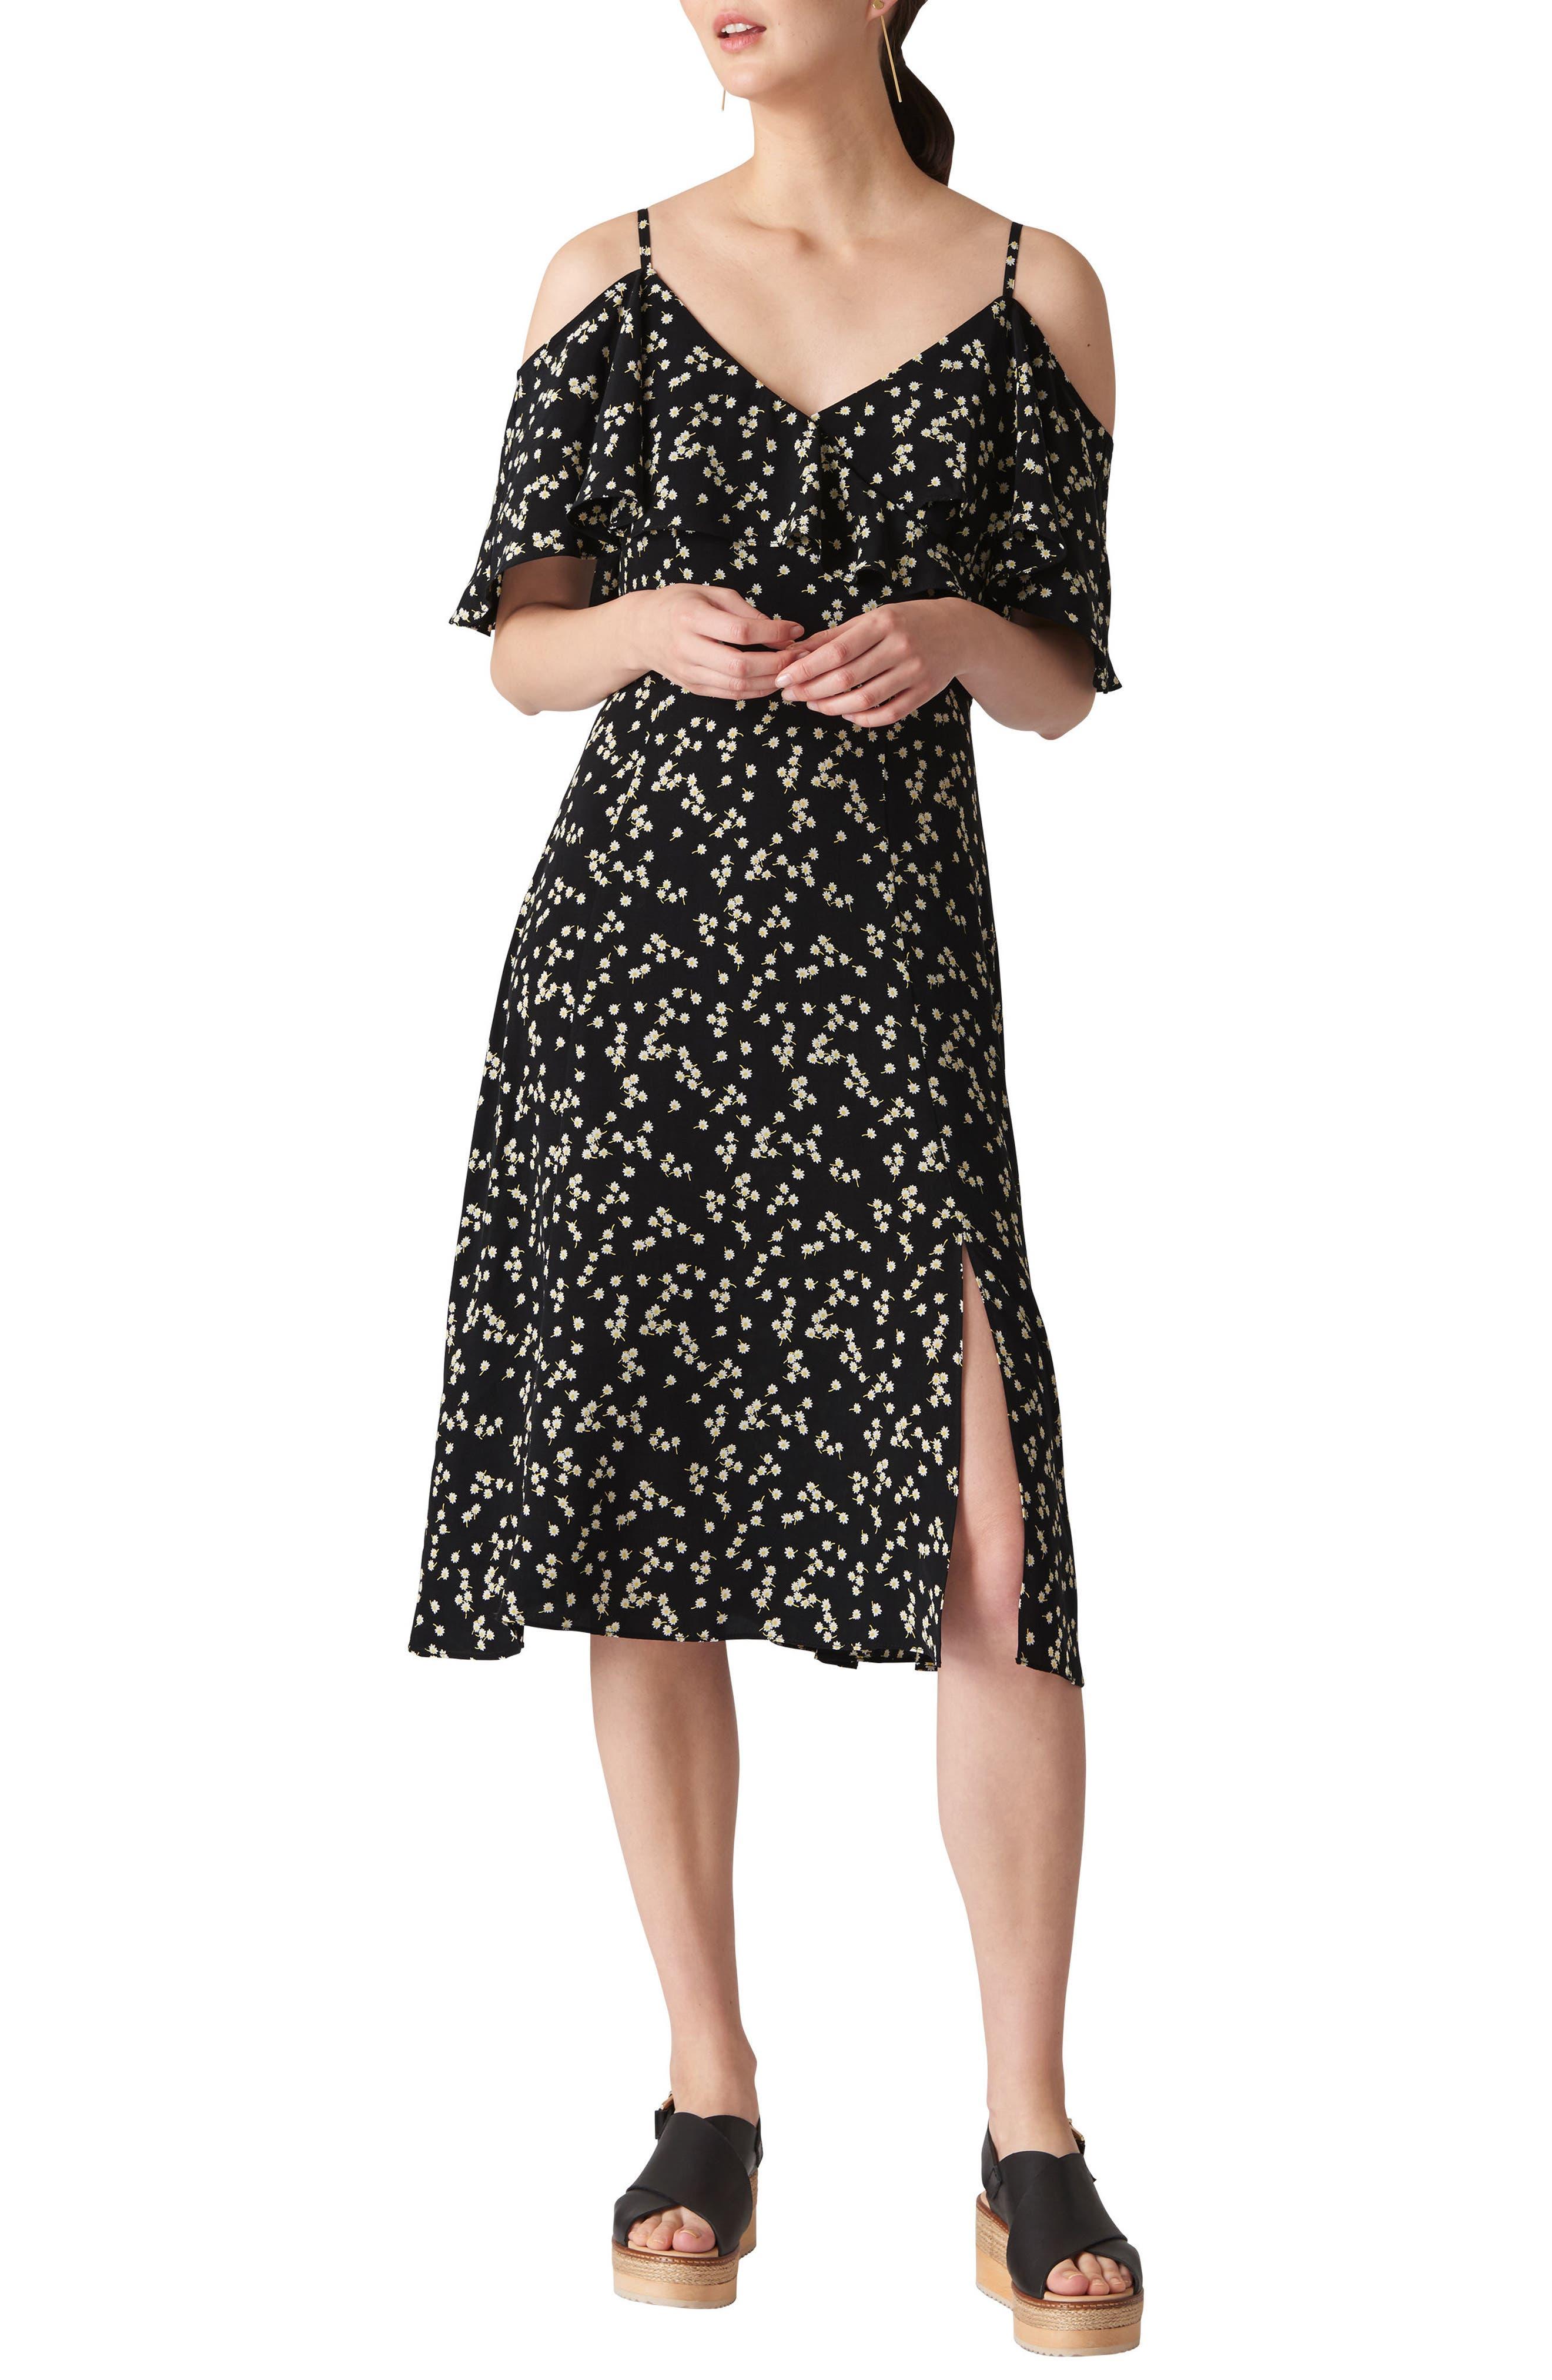 WHISTLES,                             Frill Cold Shoulder Dress,                             Main thumbnail 1, color,                             001